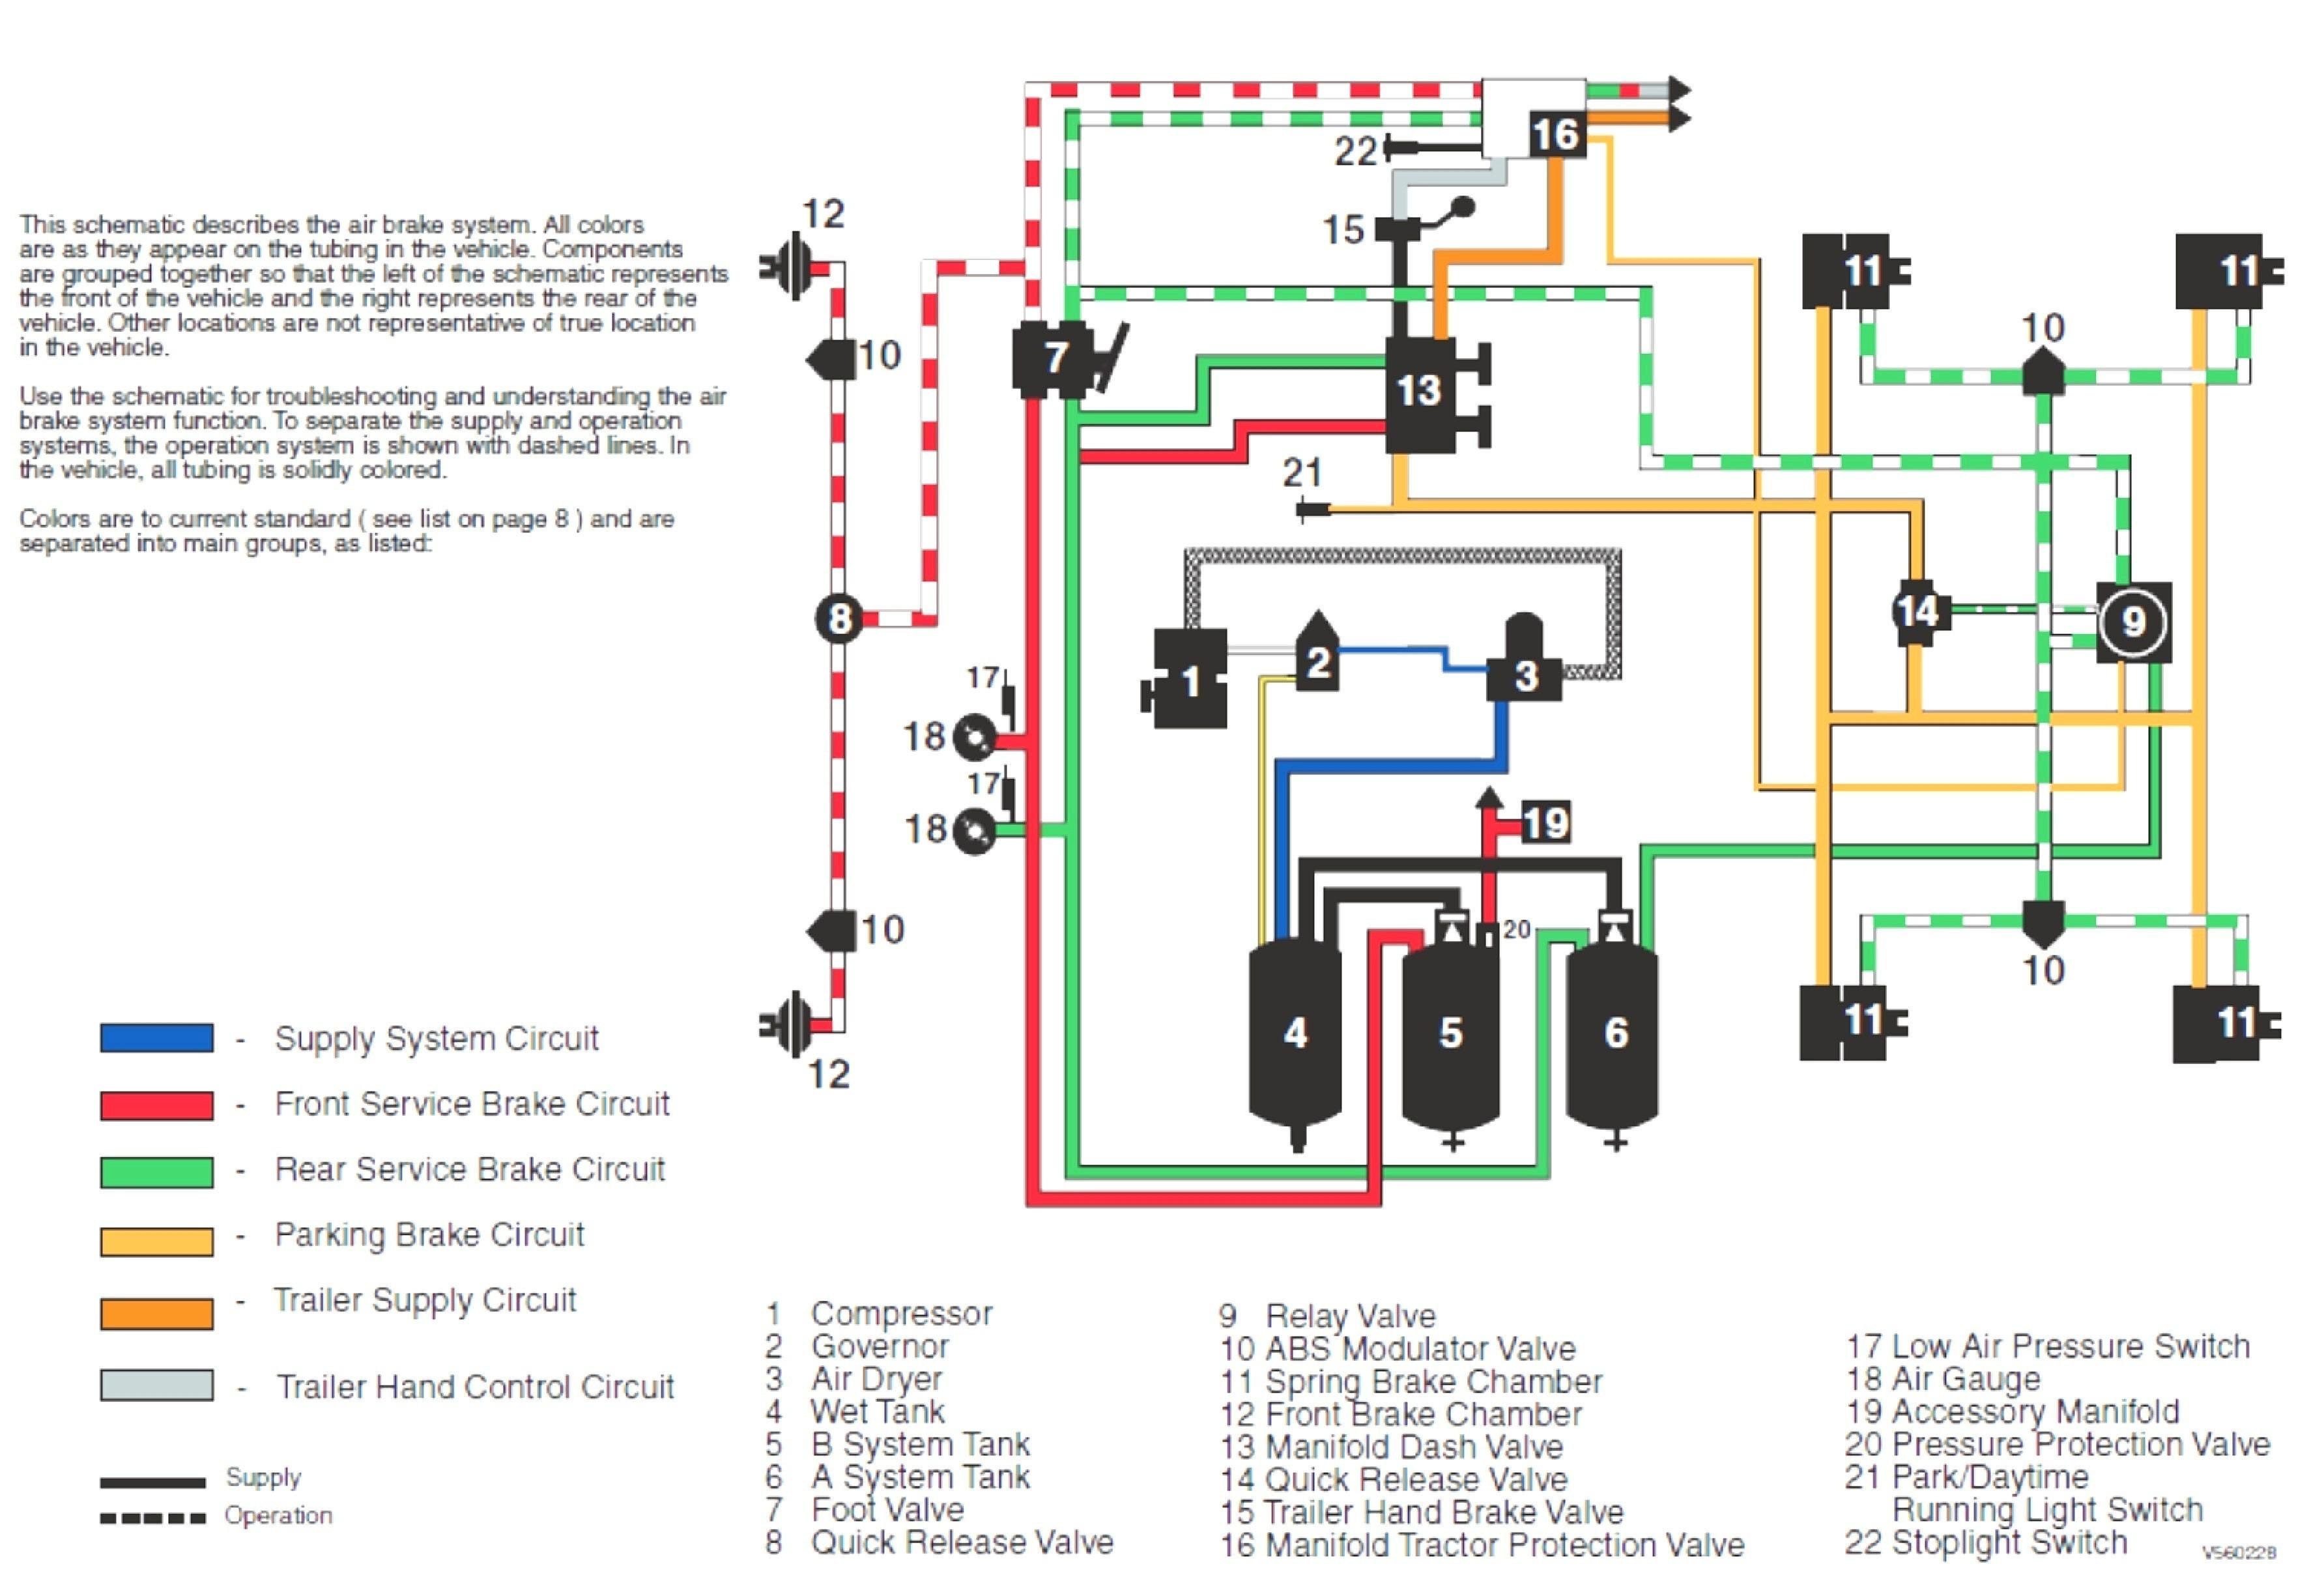 Trailer Hitch Wiring Diagram Valid Wiring Diagrams For Utility Trailer Refrence Utility Trailer Wiring